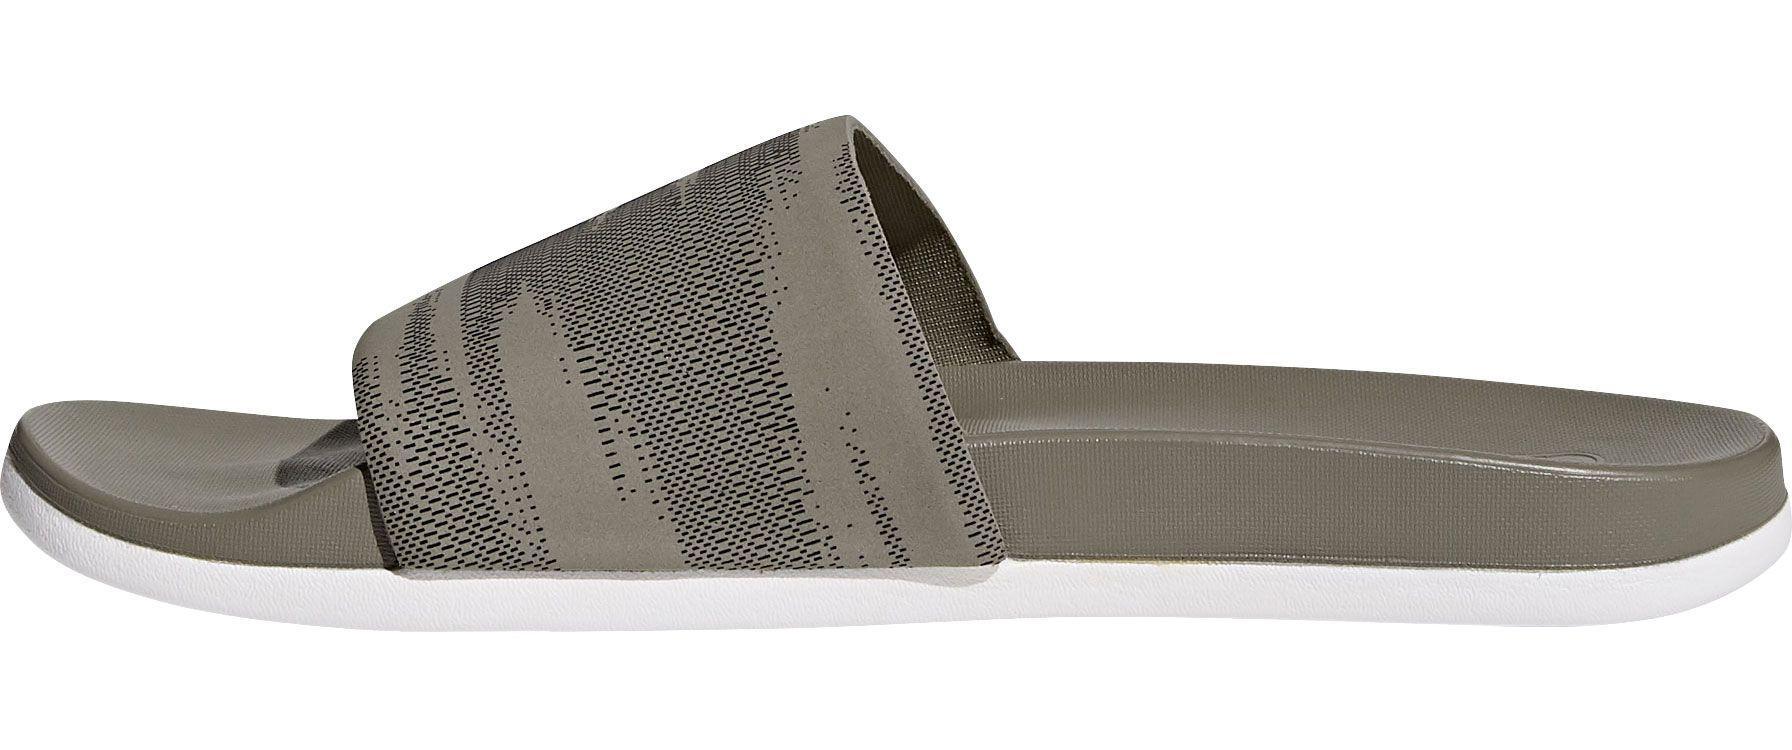 san francisco 55e44 73cf8 Lyst - adidas Adilette Cloudfoam Plus Slides in Black for Me